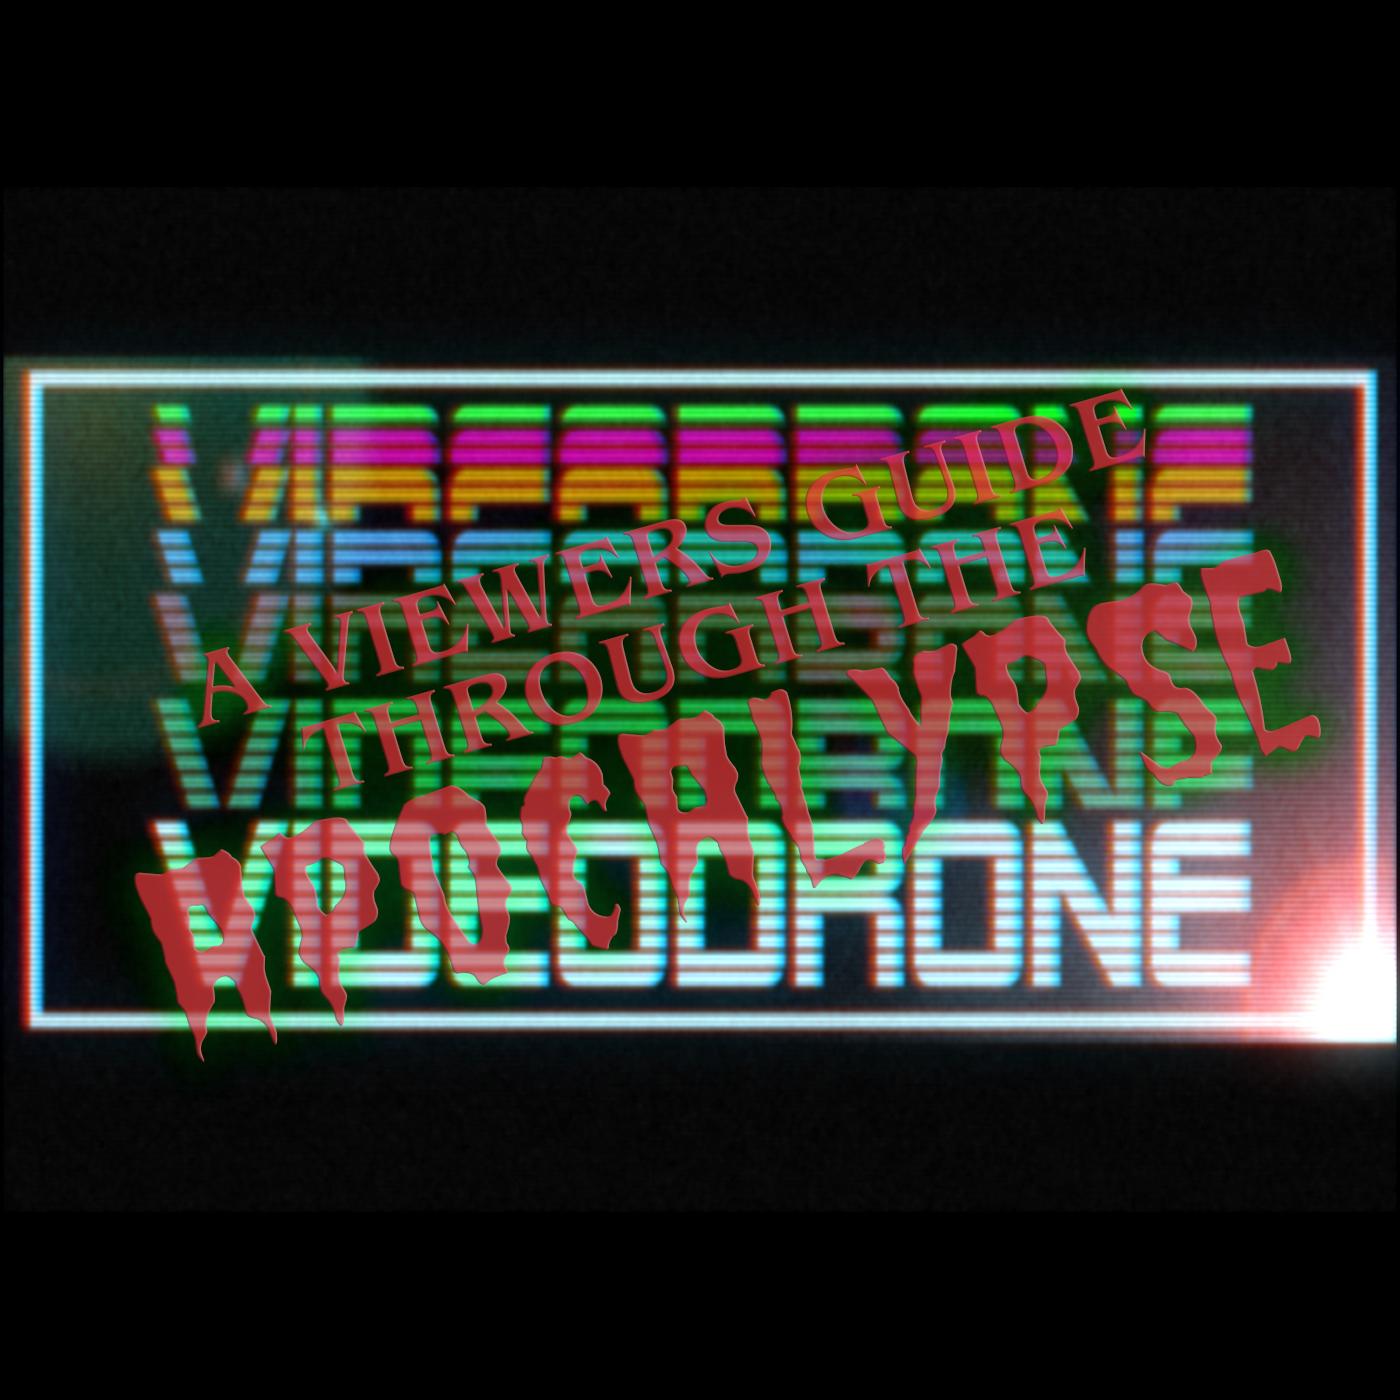 VIDEODRONETULSA: A Viewers Guide through the Apocalypse show art